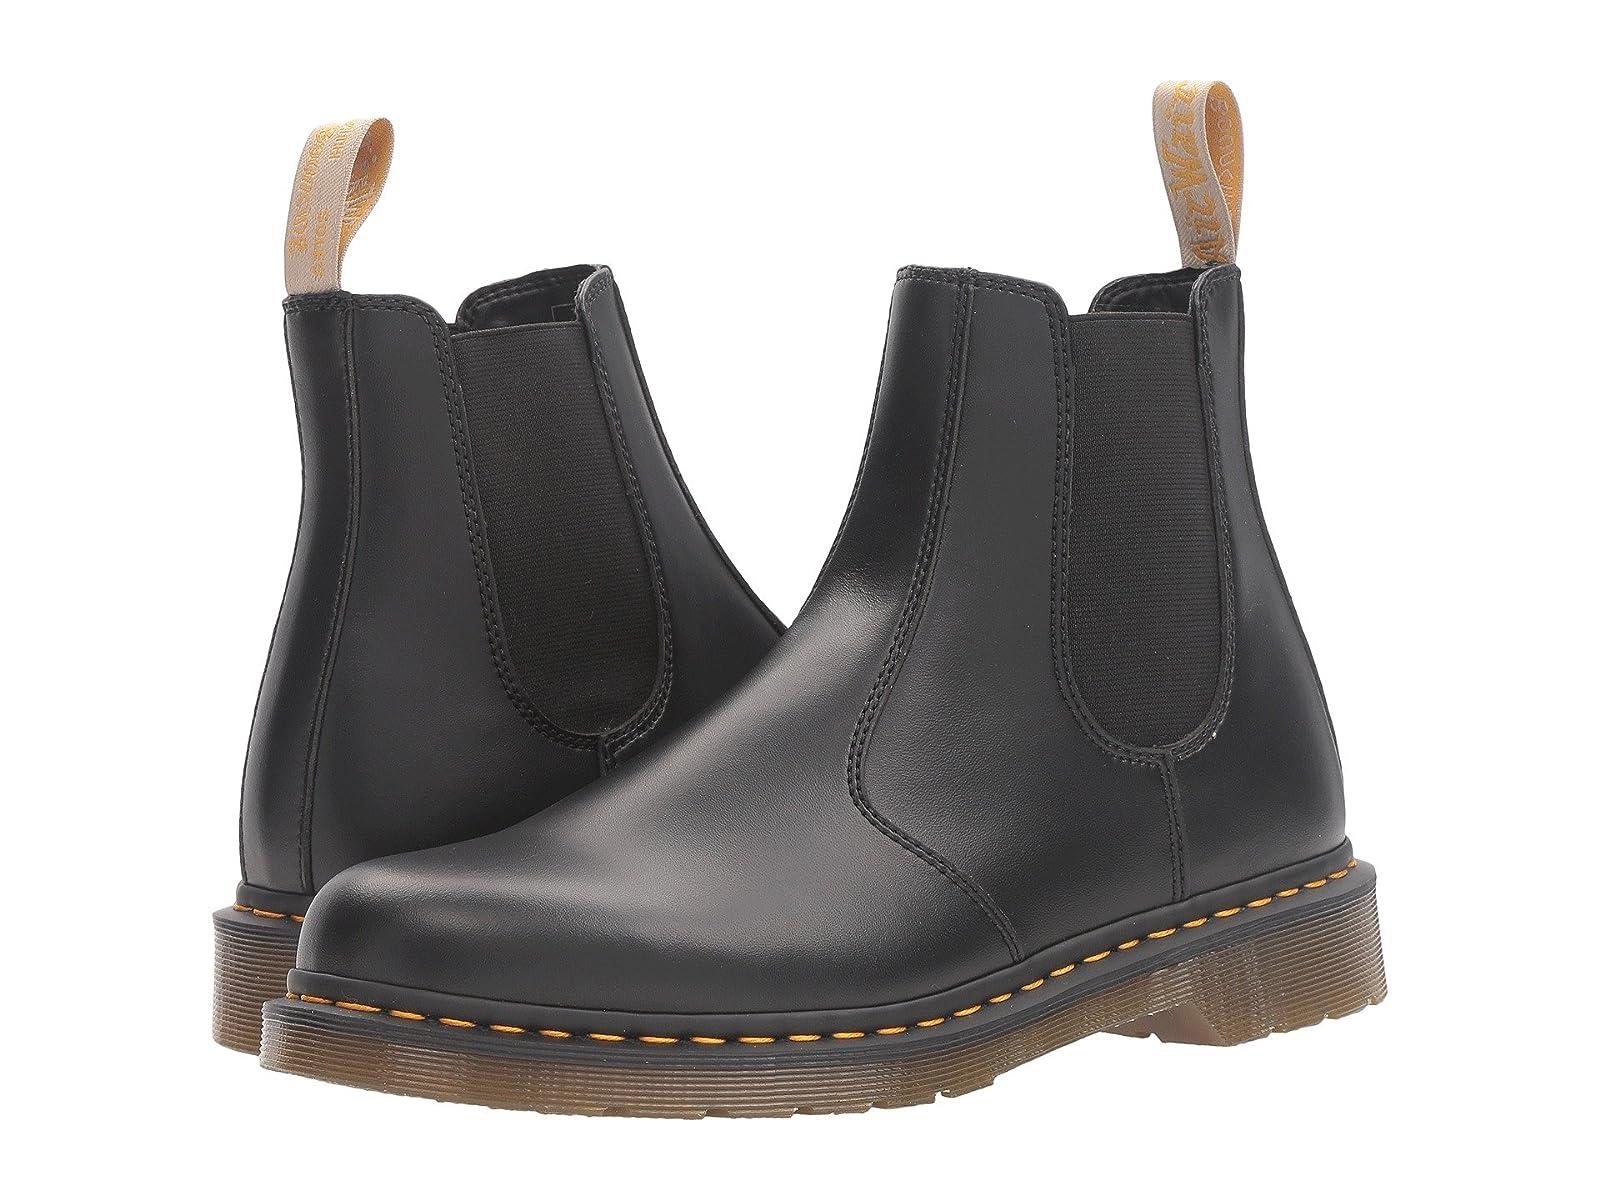 Dr. Martens 2976 Vegan Chelsea BootAffordable and distinctive shoes